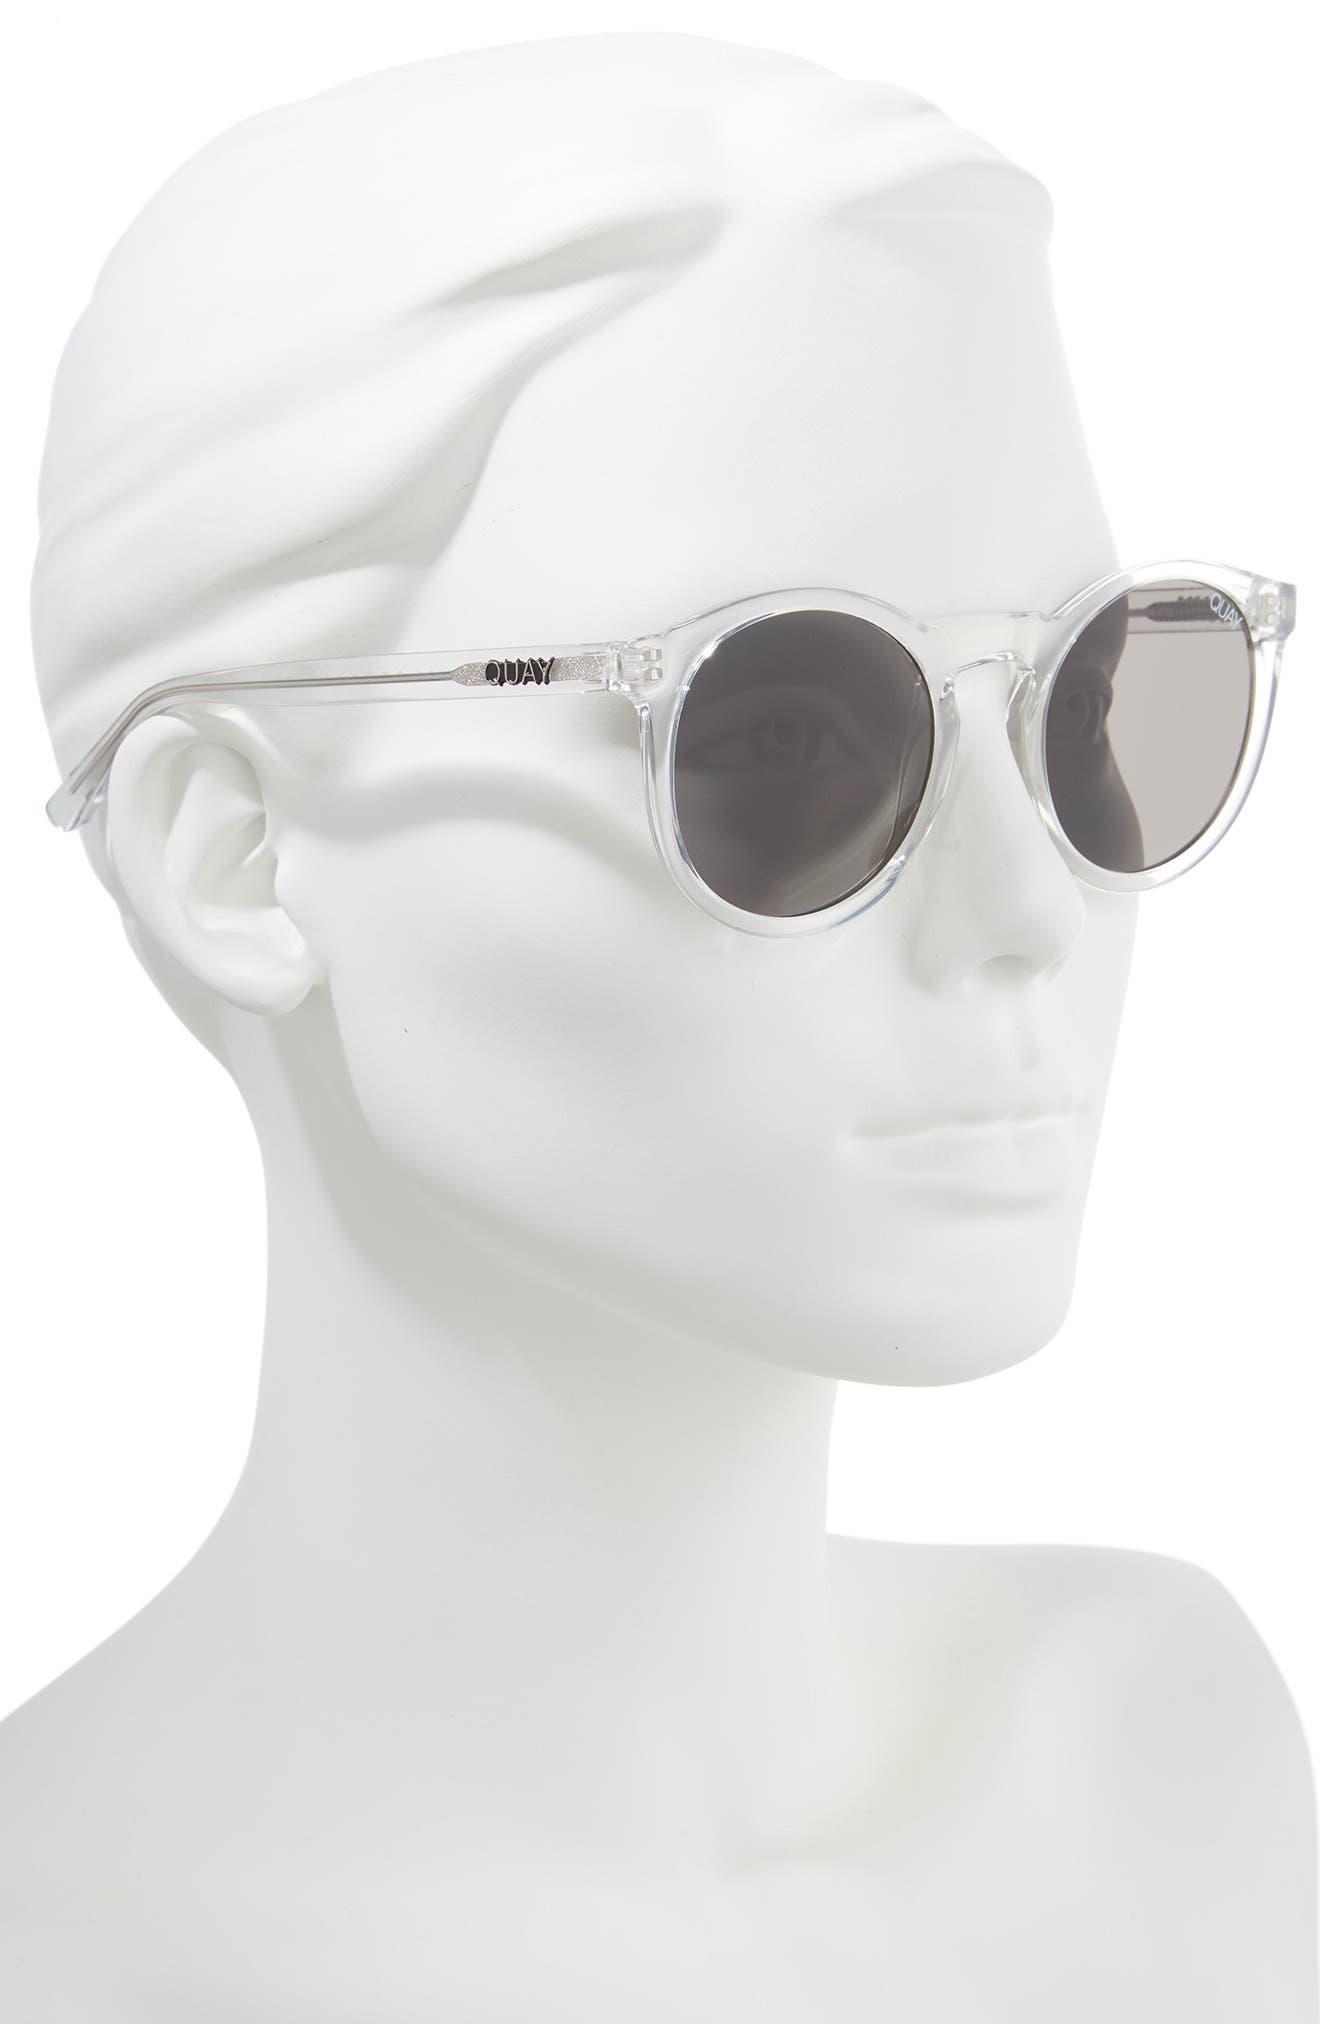 Kosha 49mm Round Sunglasses,                             Alternate thumbnail 2, color,                             100